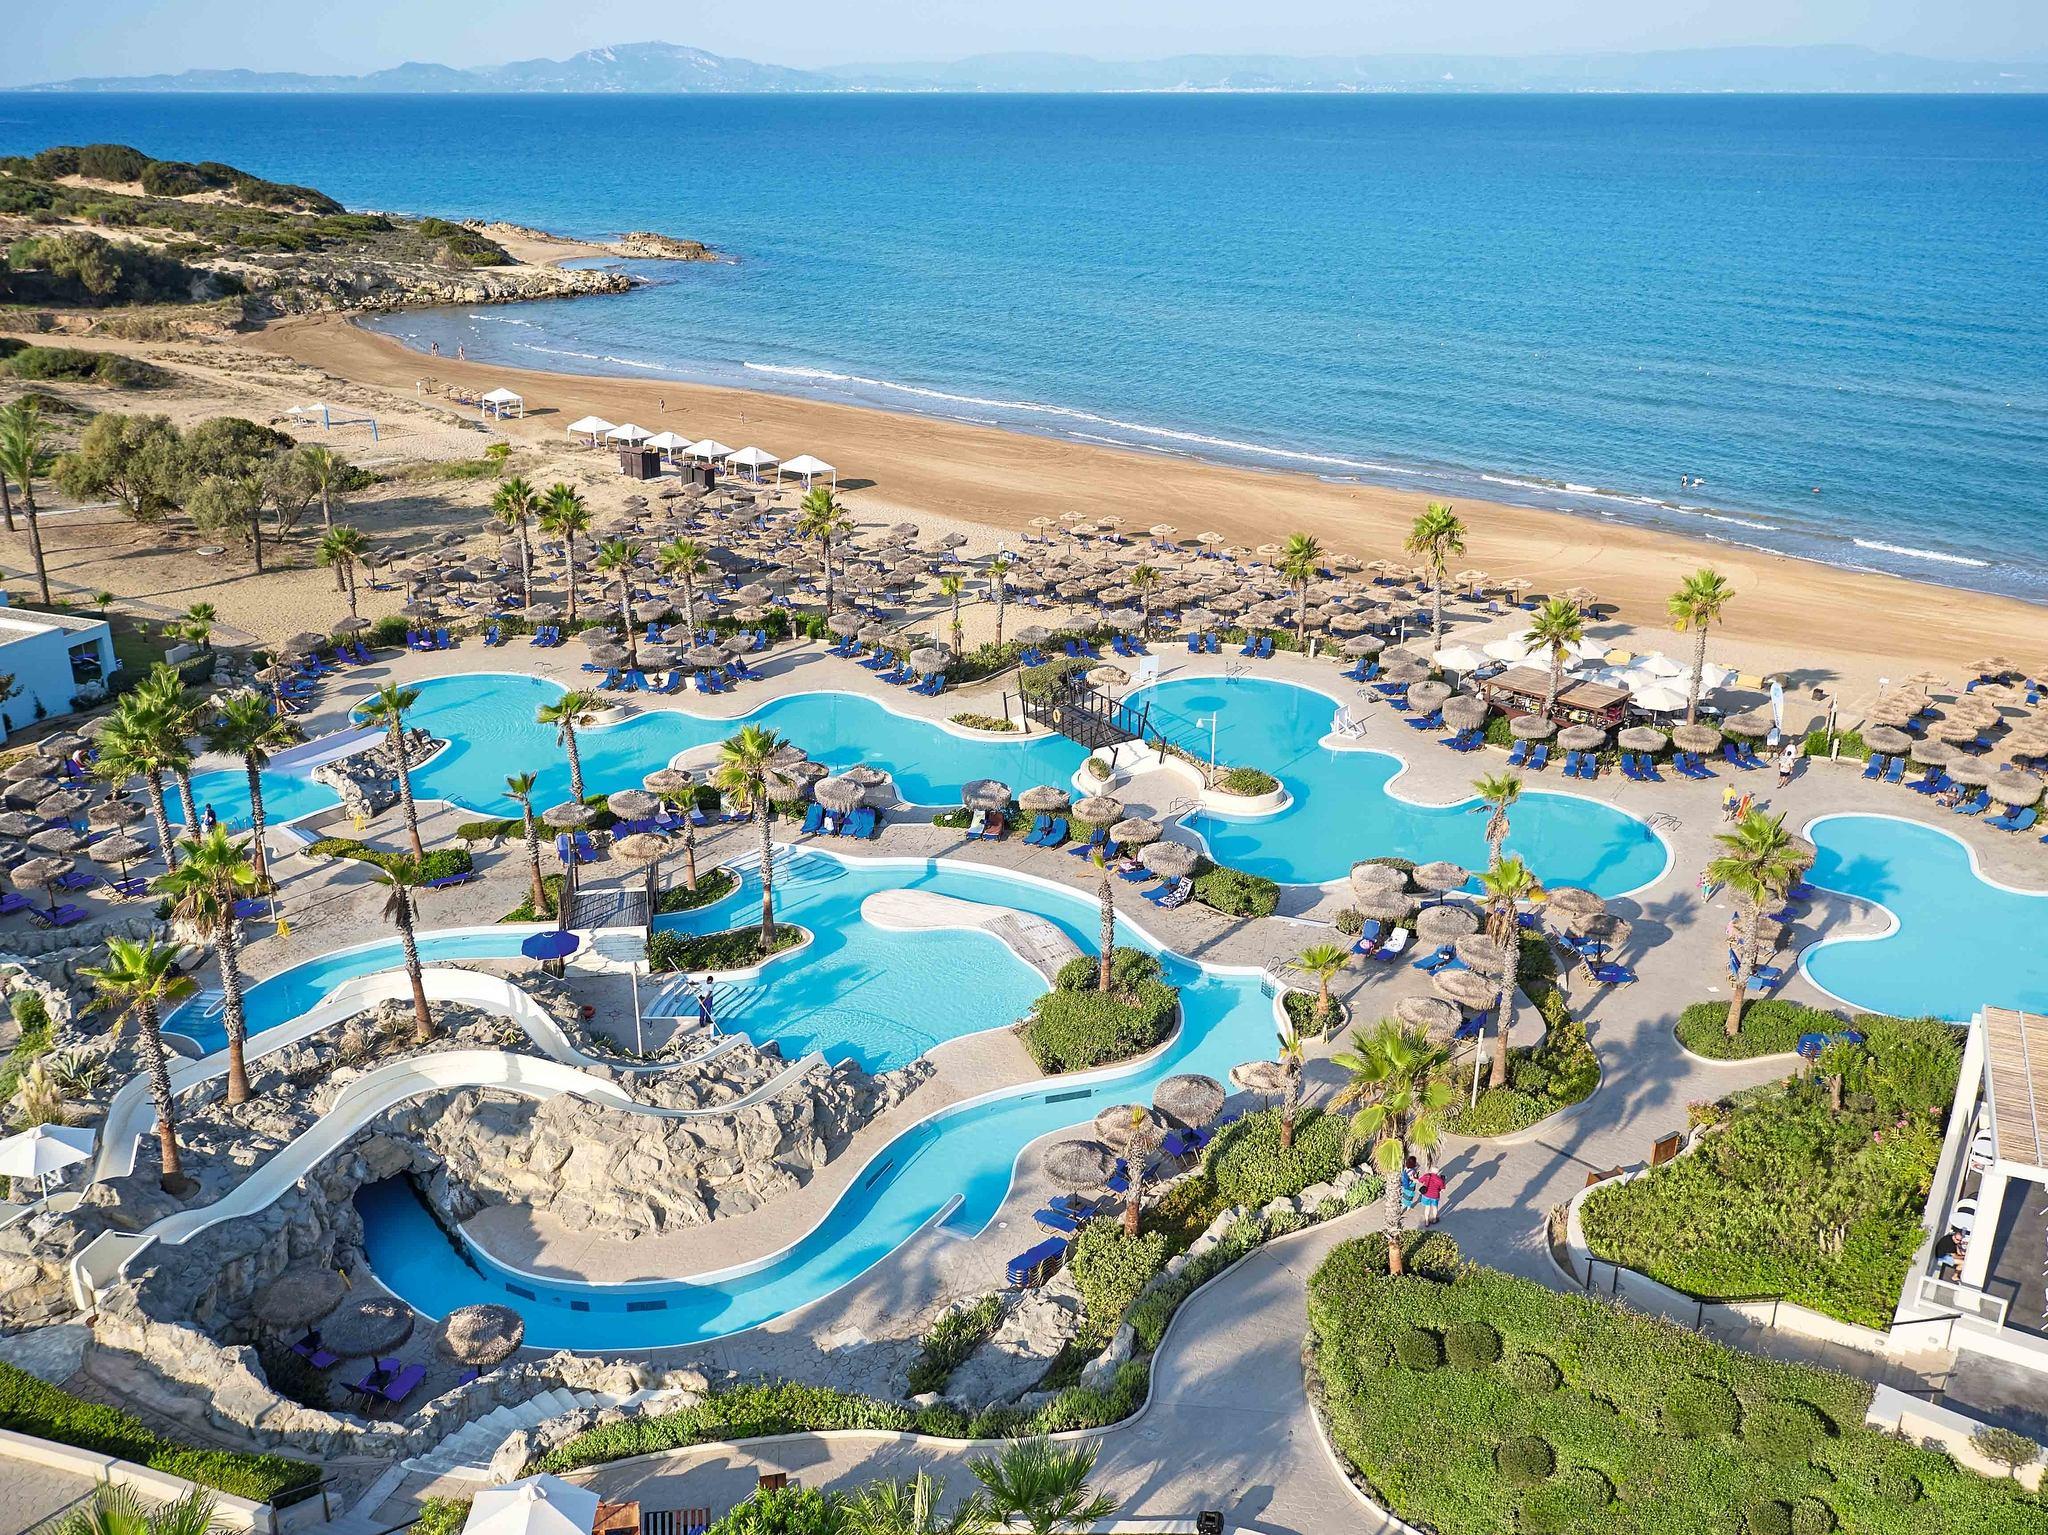 Luxury Hotels, Luxury Villa, Greece Hotels, Luxury holiday, Hotel rent, Greece hotel rent, vip hotel, Olympia Riviera Resort